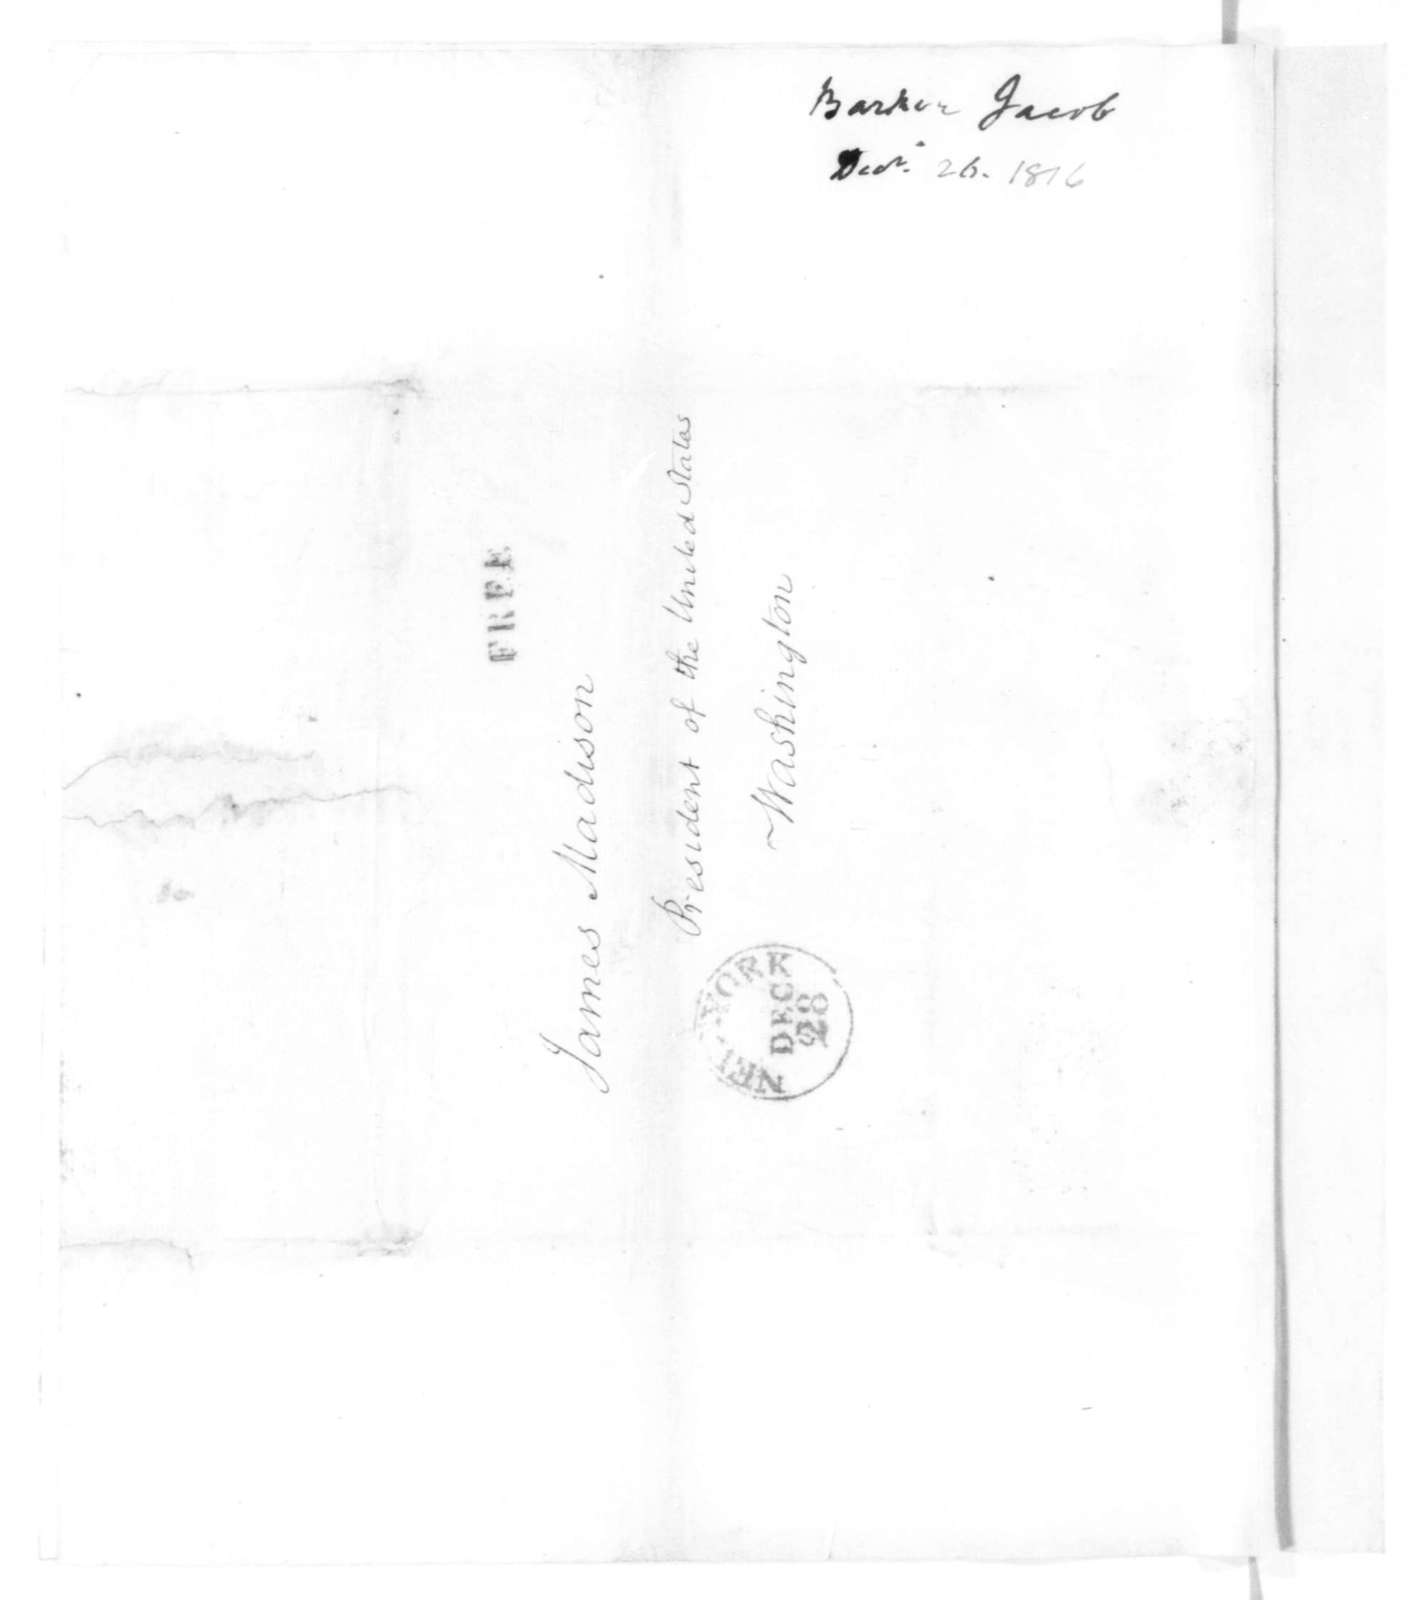 Jacob Barker to James Madison, December 26, 1815.